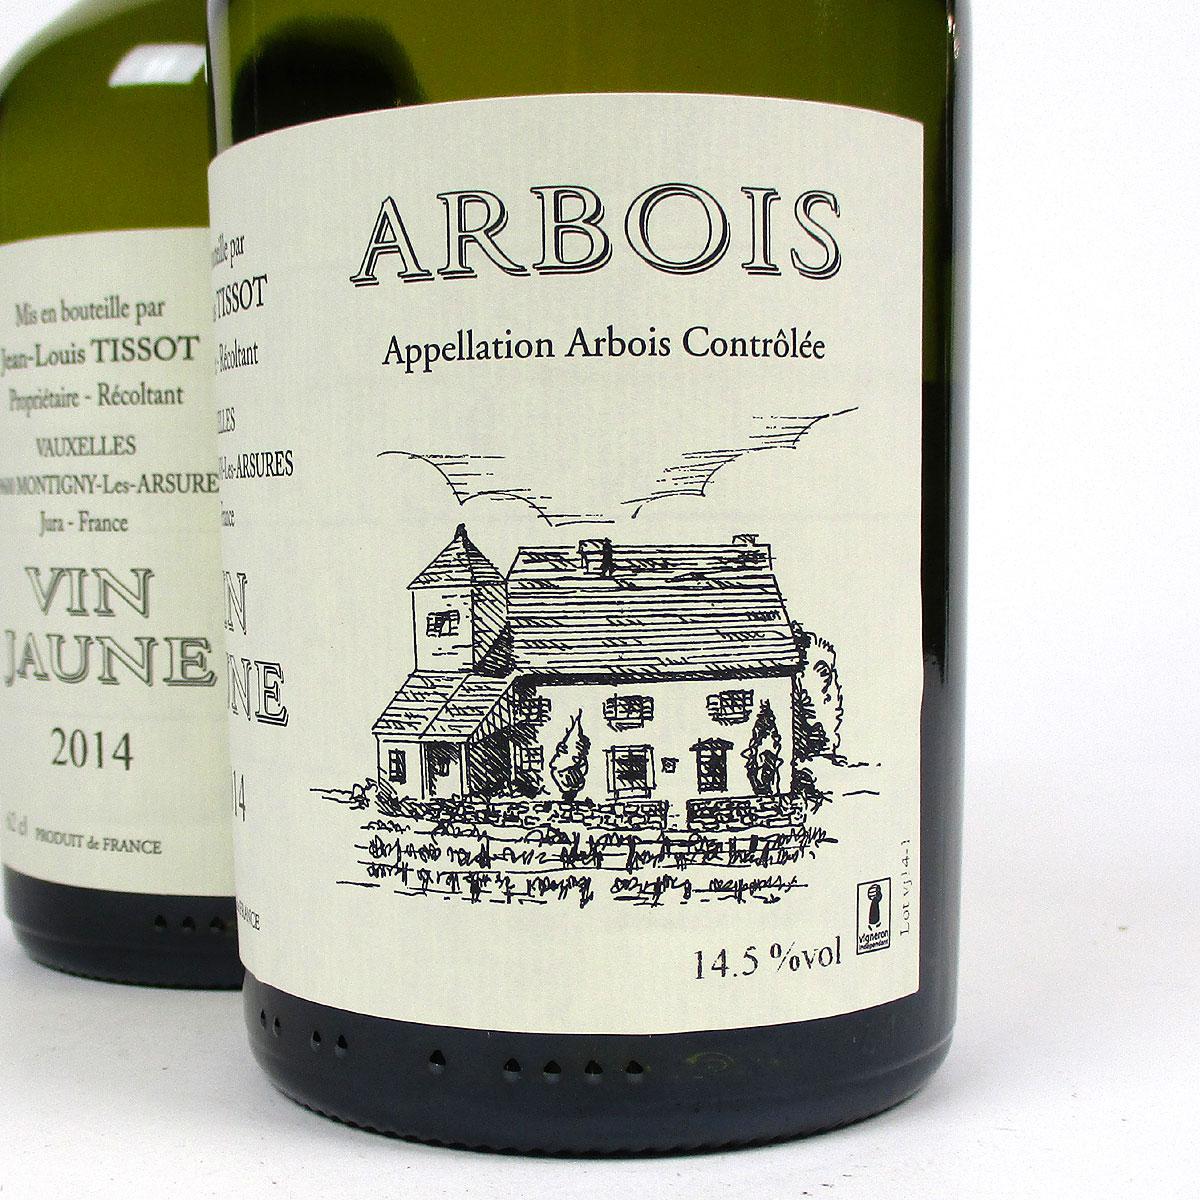 Jura Arbois: Vin Jaune Domaine Jean-Louis Tissot 2014